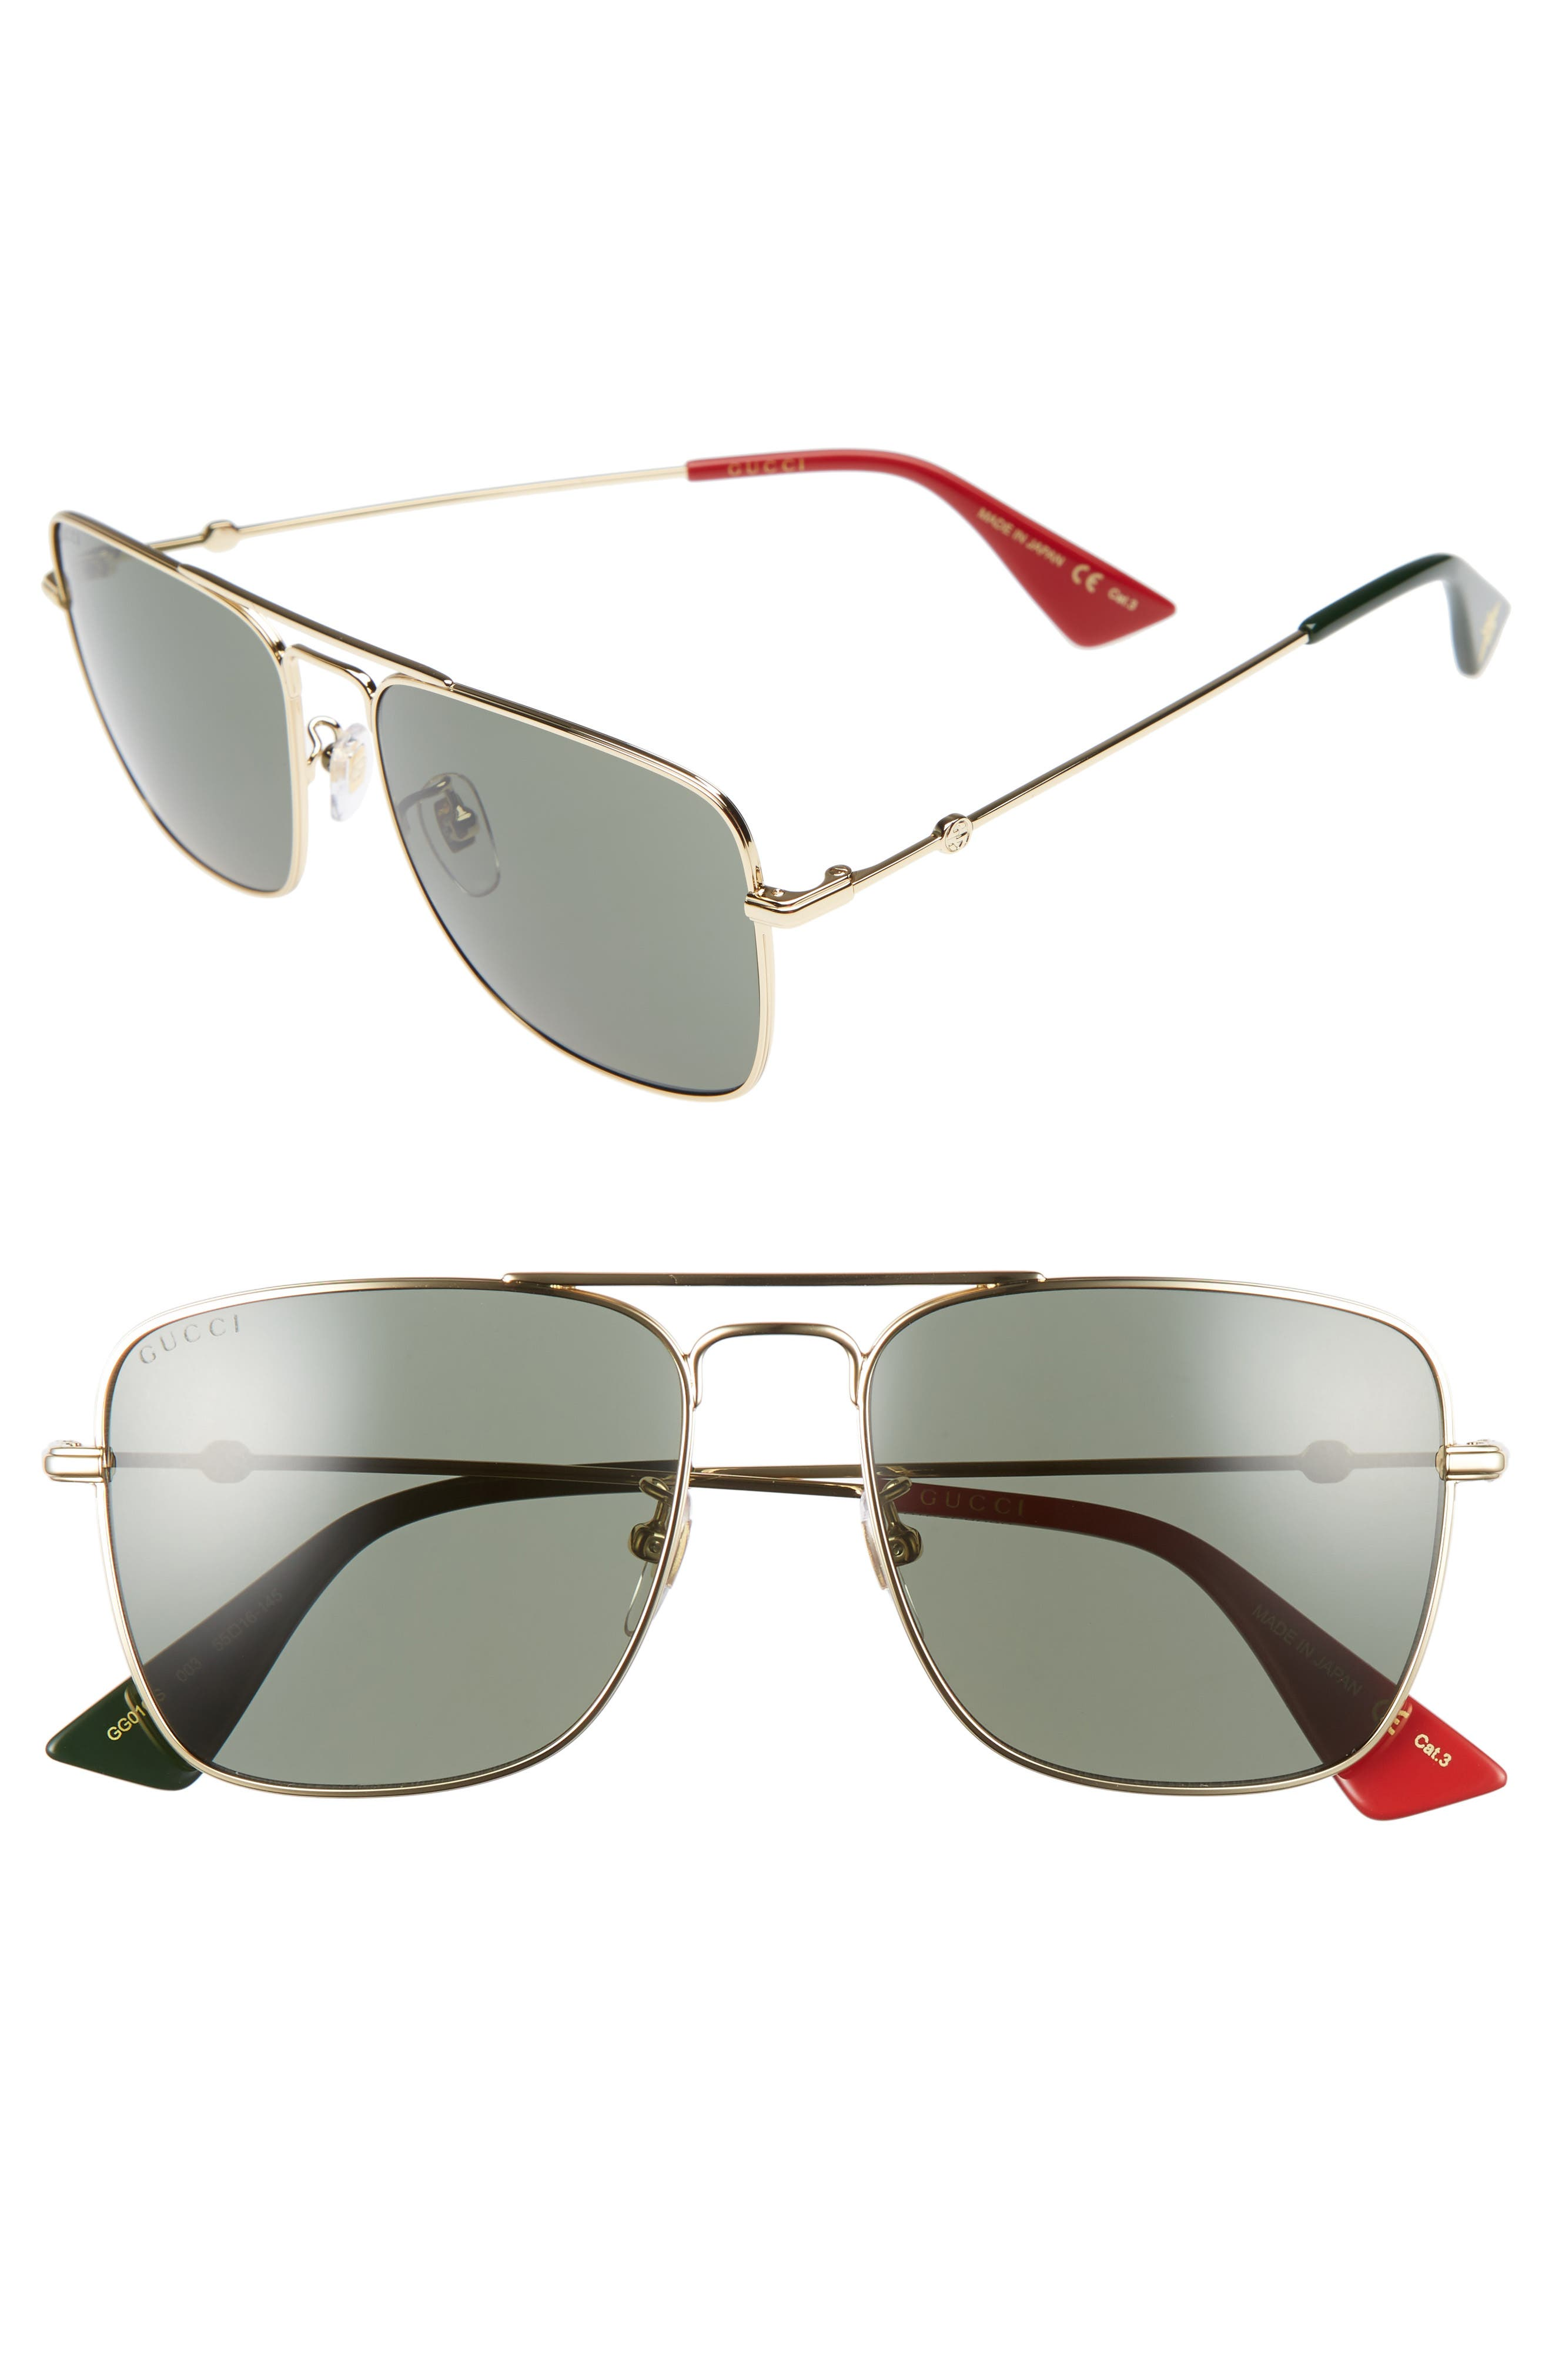 Caravan 55mm Square Aviator Sunglasses,                             Main thumbnail 1, color,                             Gold/ Green